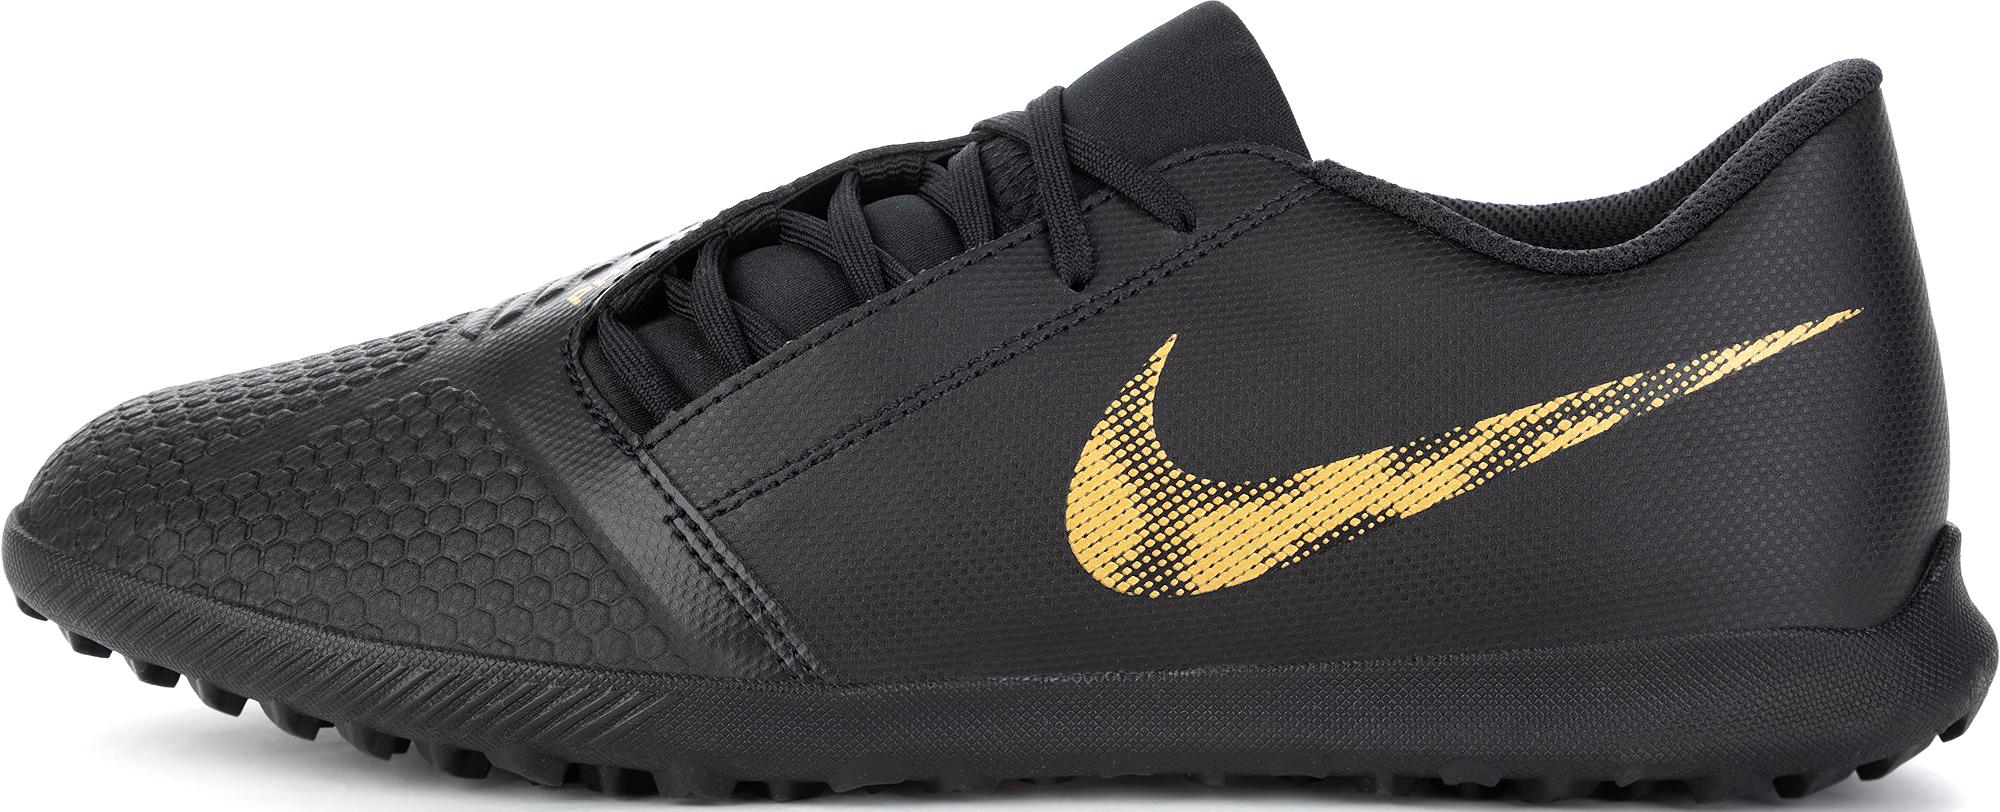 Nike Бутсы мужские Nike Phantom Venom Club TF, размер 44 цена в Москве и Питере